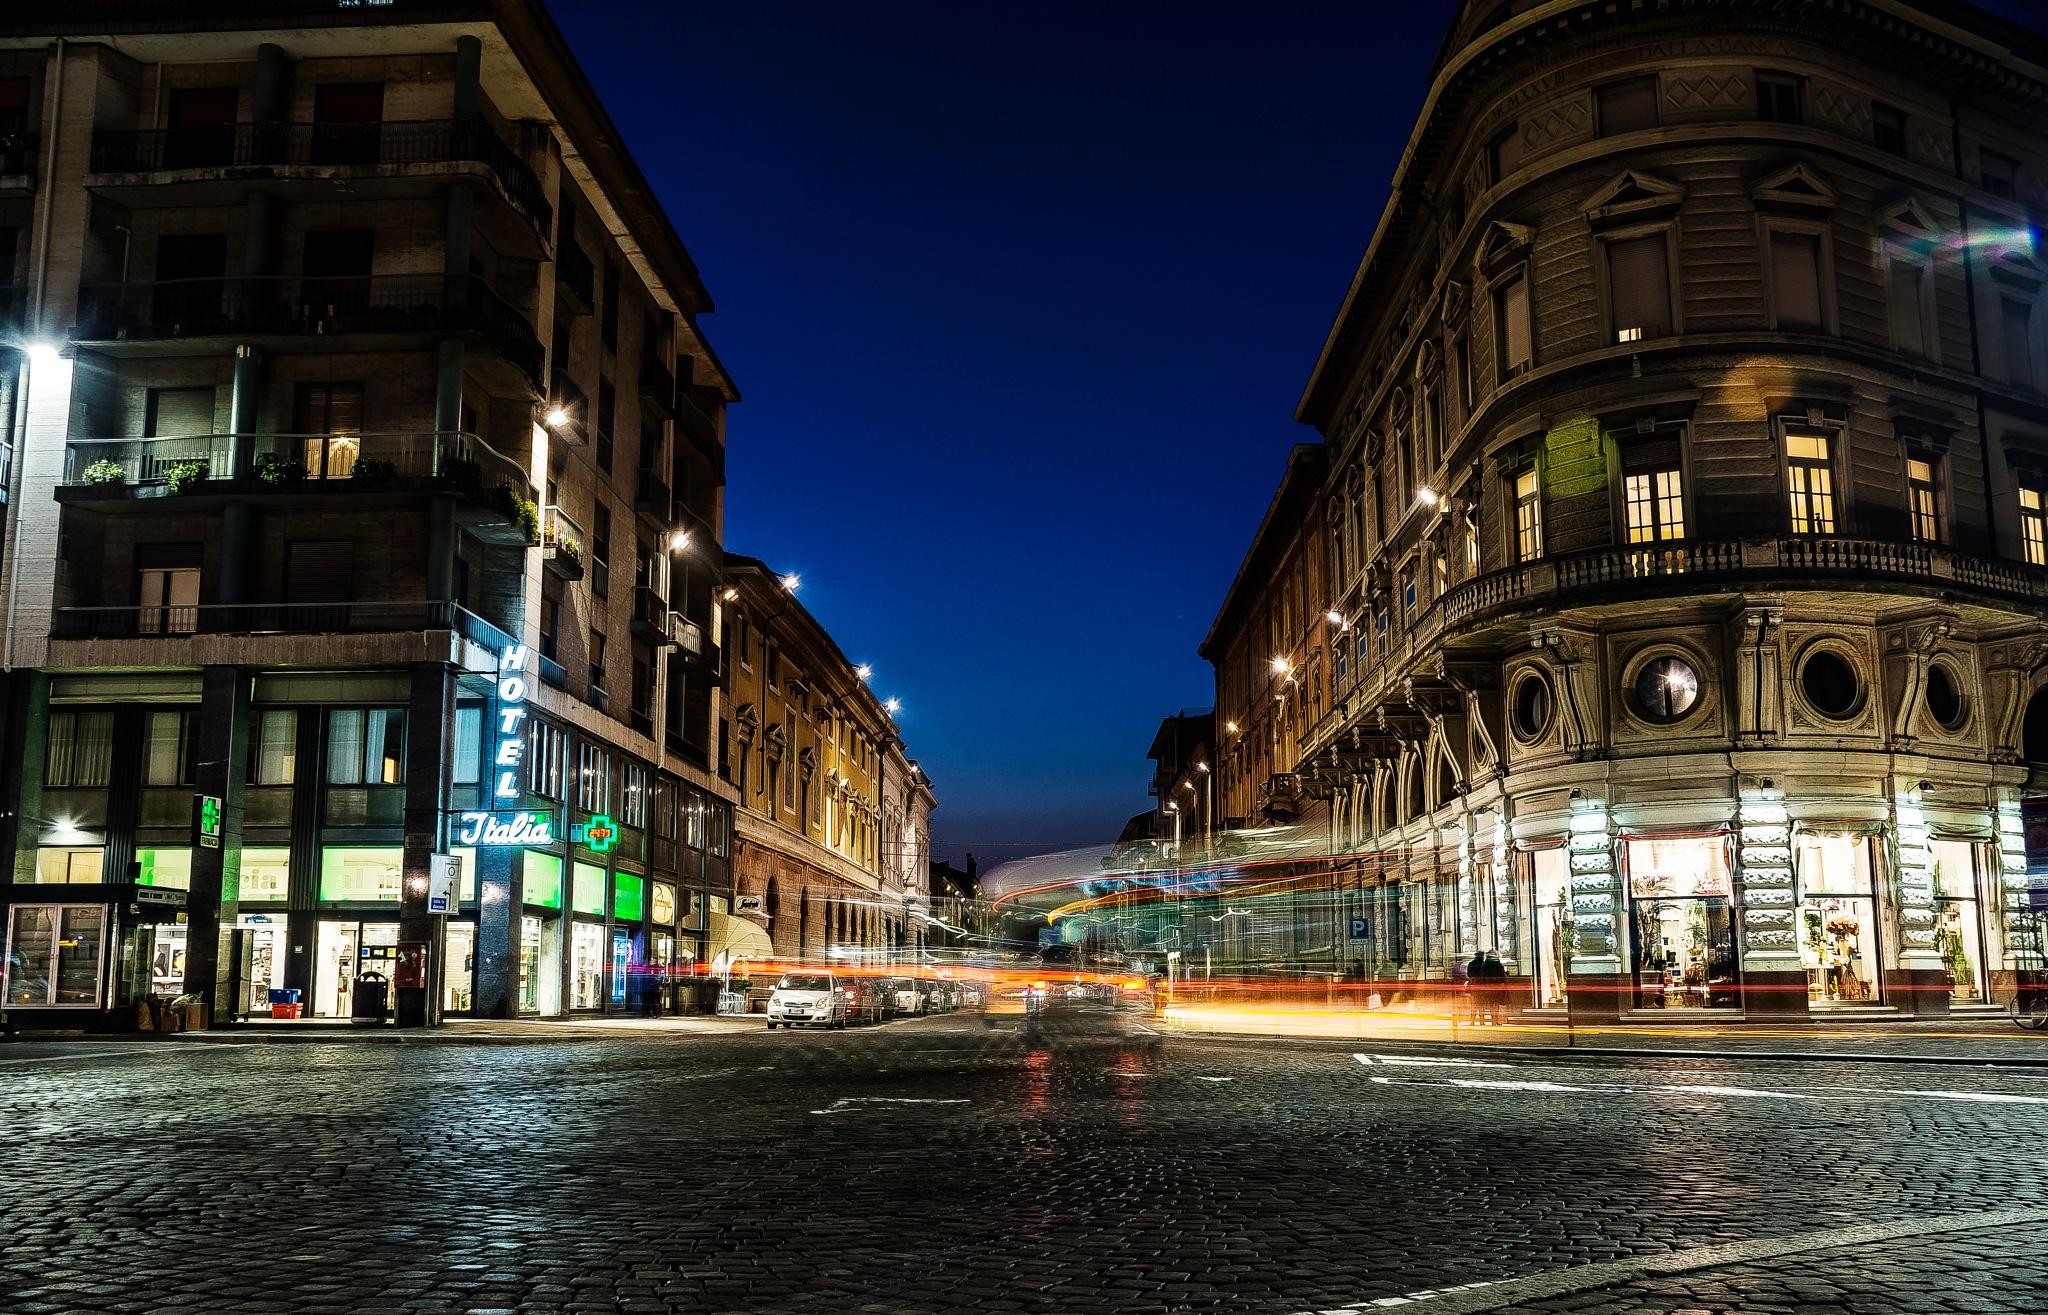 Mantua by Luca Prandi